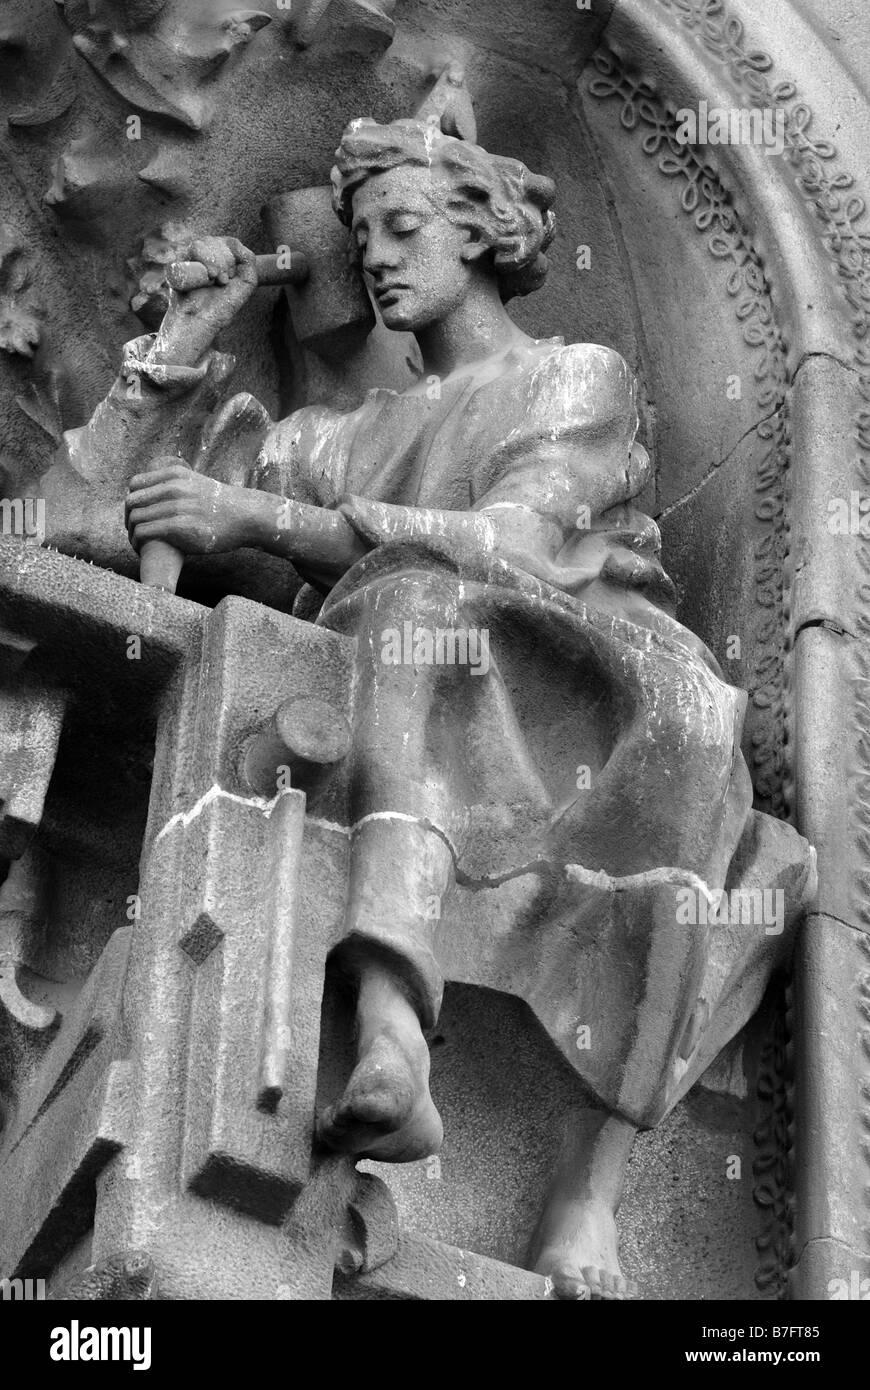 Sagrada Familia decorations - Stock Image